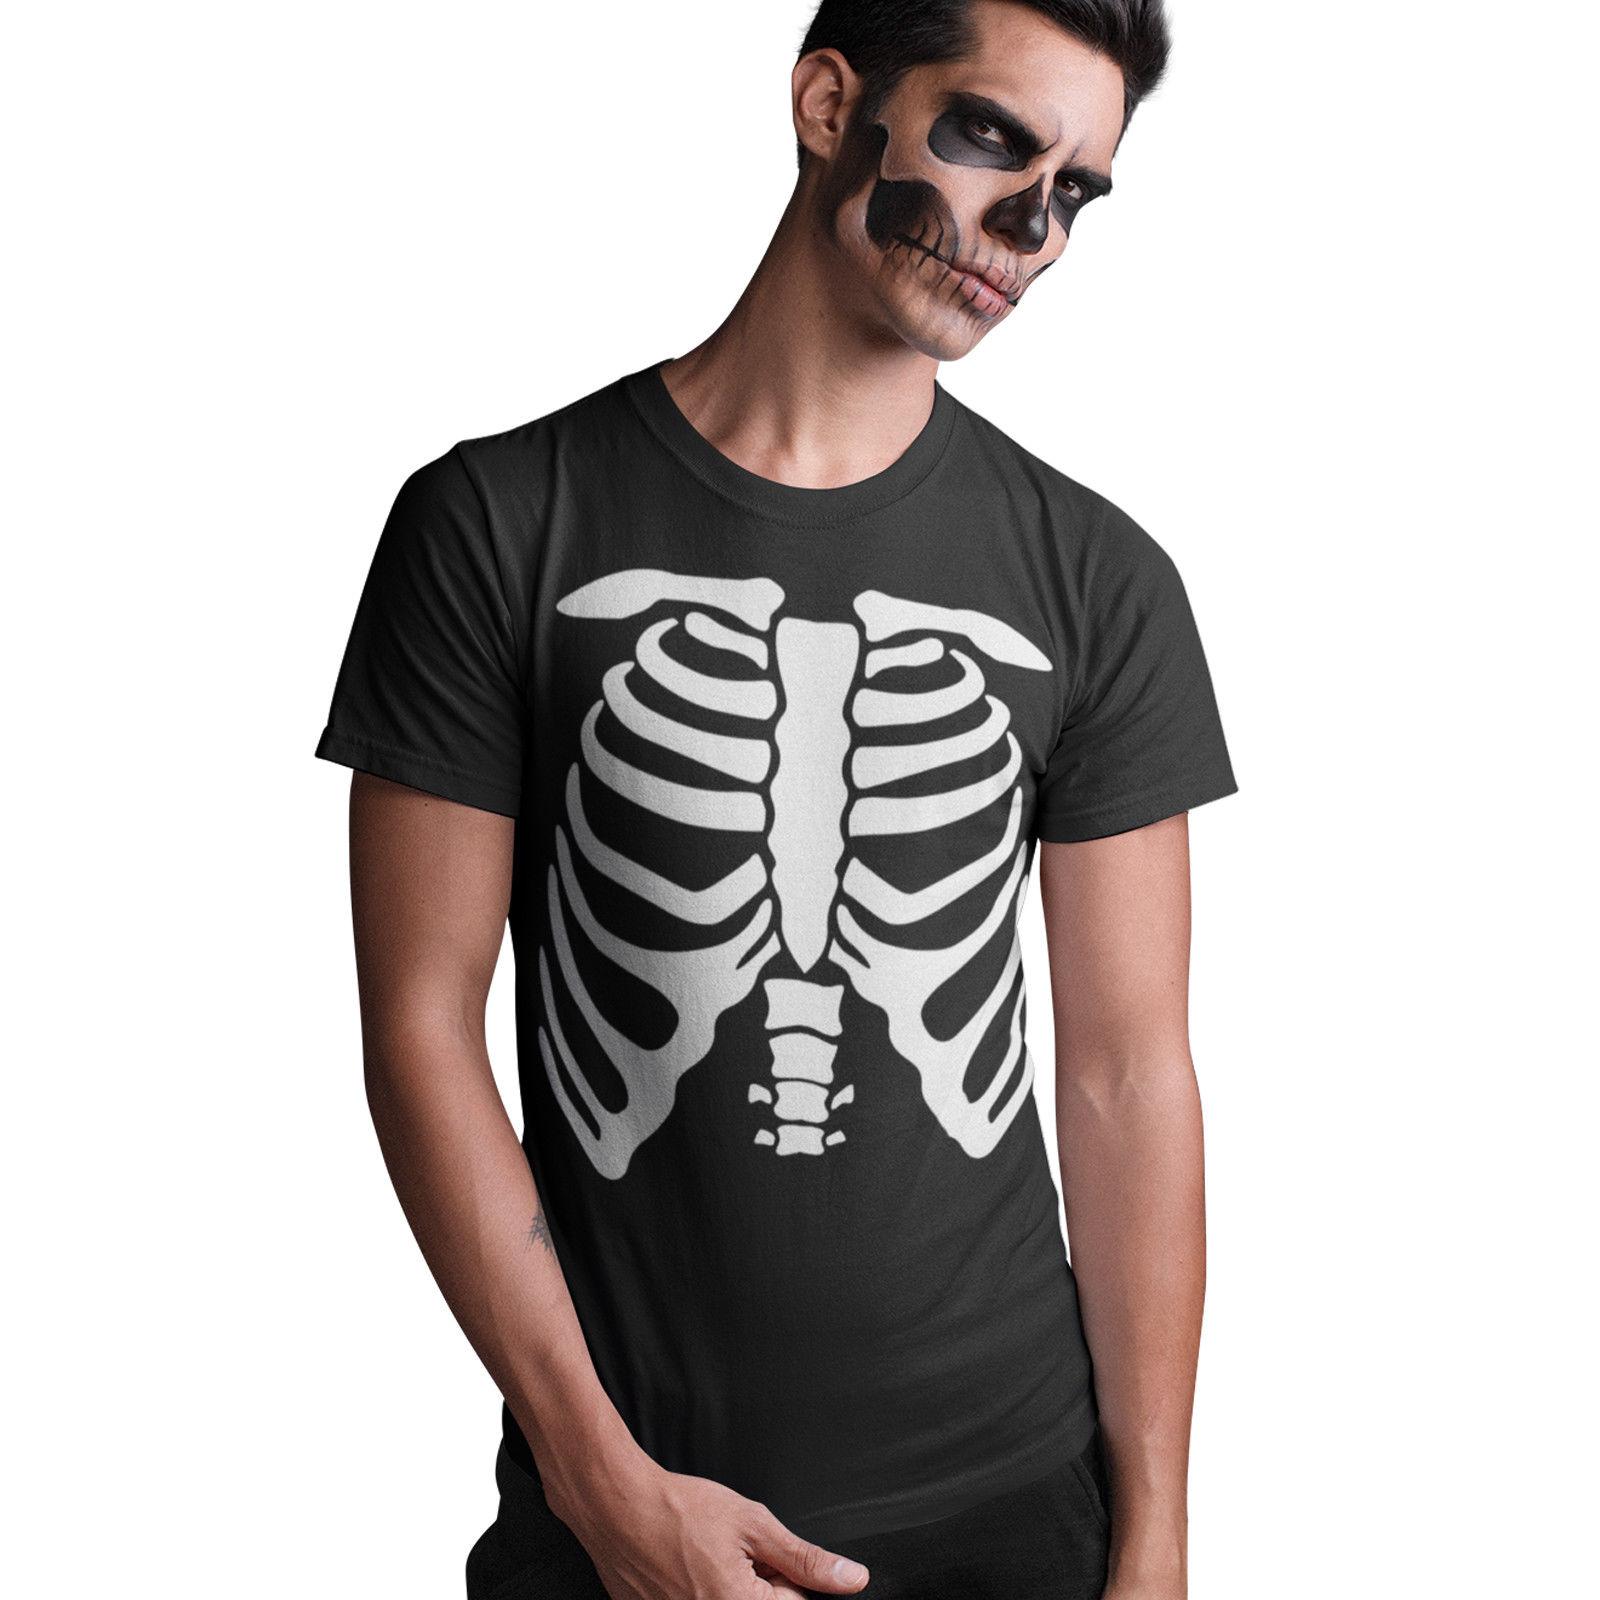 Halloween Skeleton Fancy Dress T Shirt Skull Mens Womens Childrens Black Party free shipping cheap tee Fashion Style Men Tee